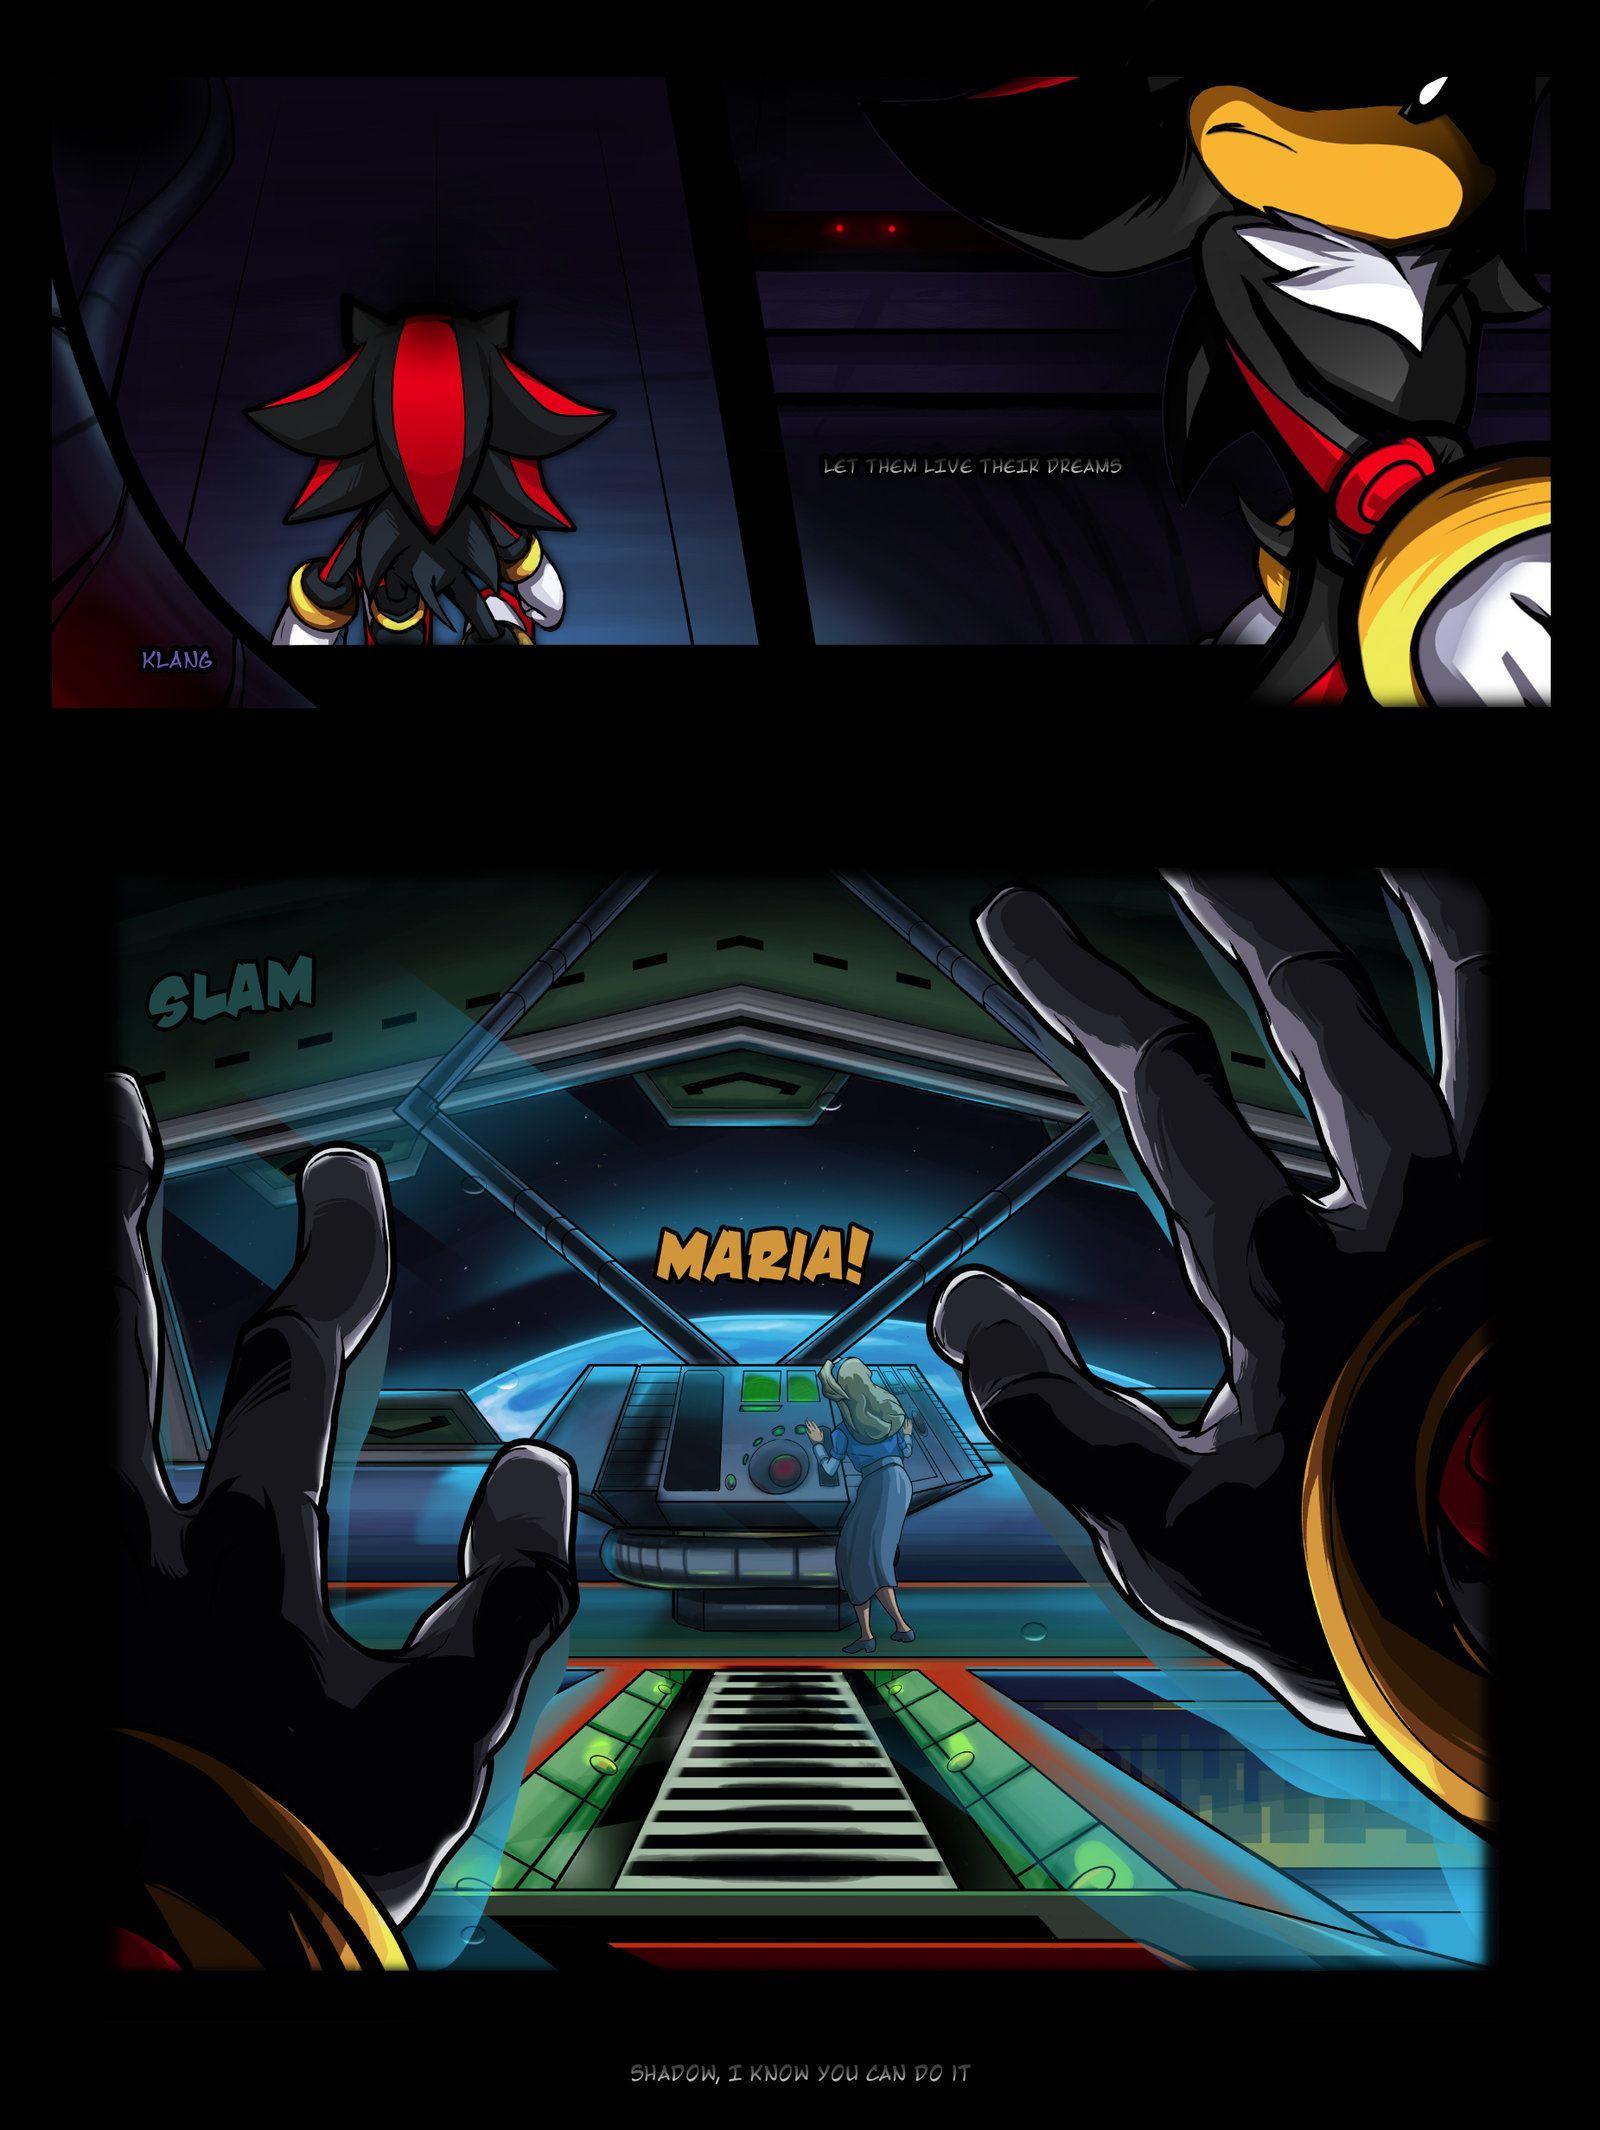 Sonic Adventure 3 006 by ThatMFZguy deviantart com on